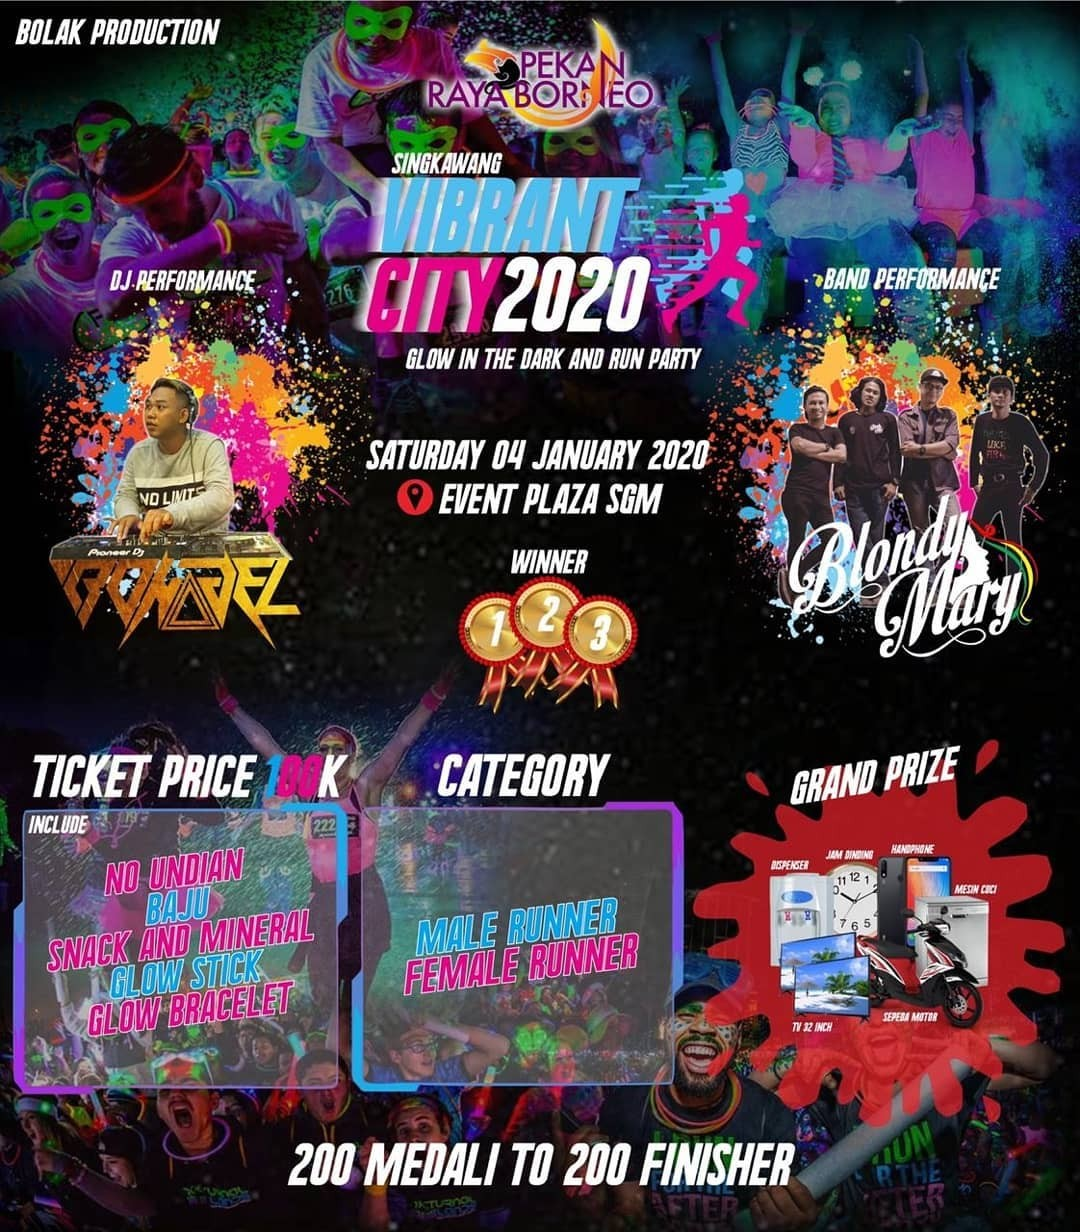 Vibrant City • 2020